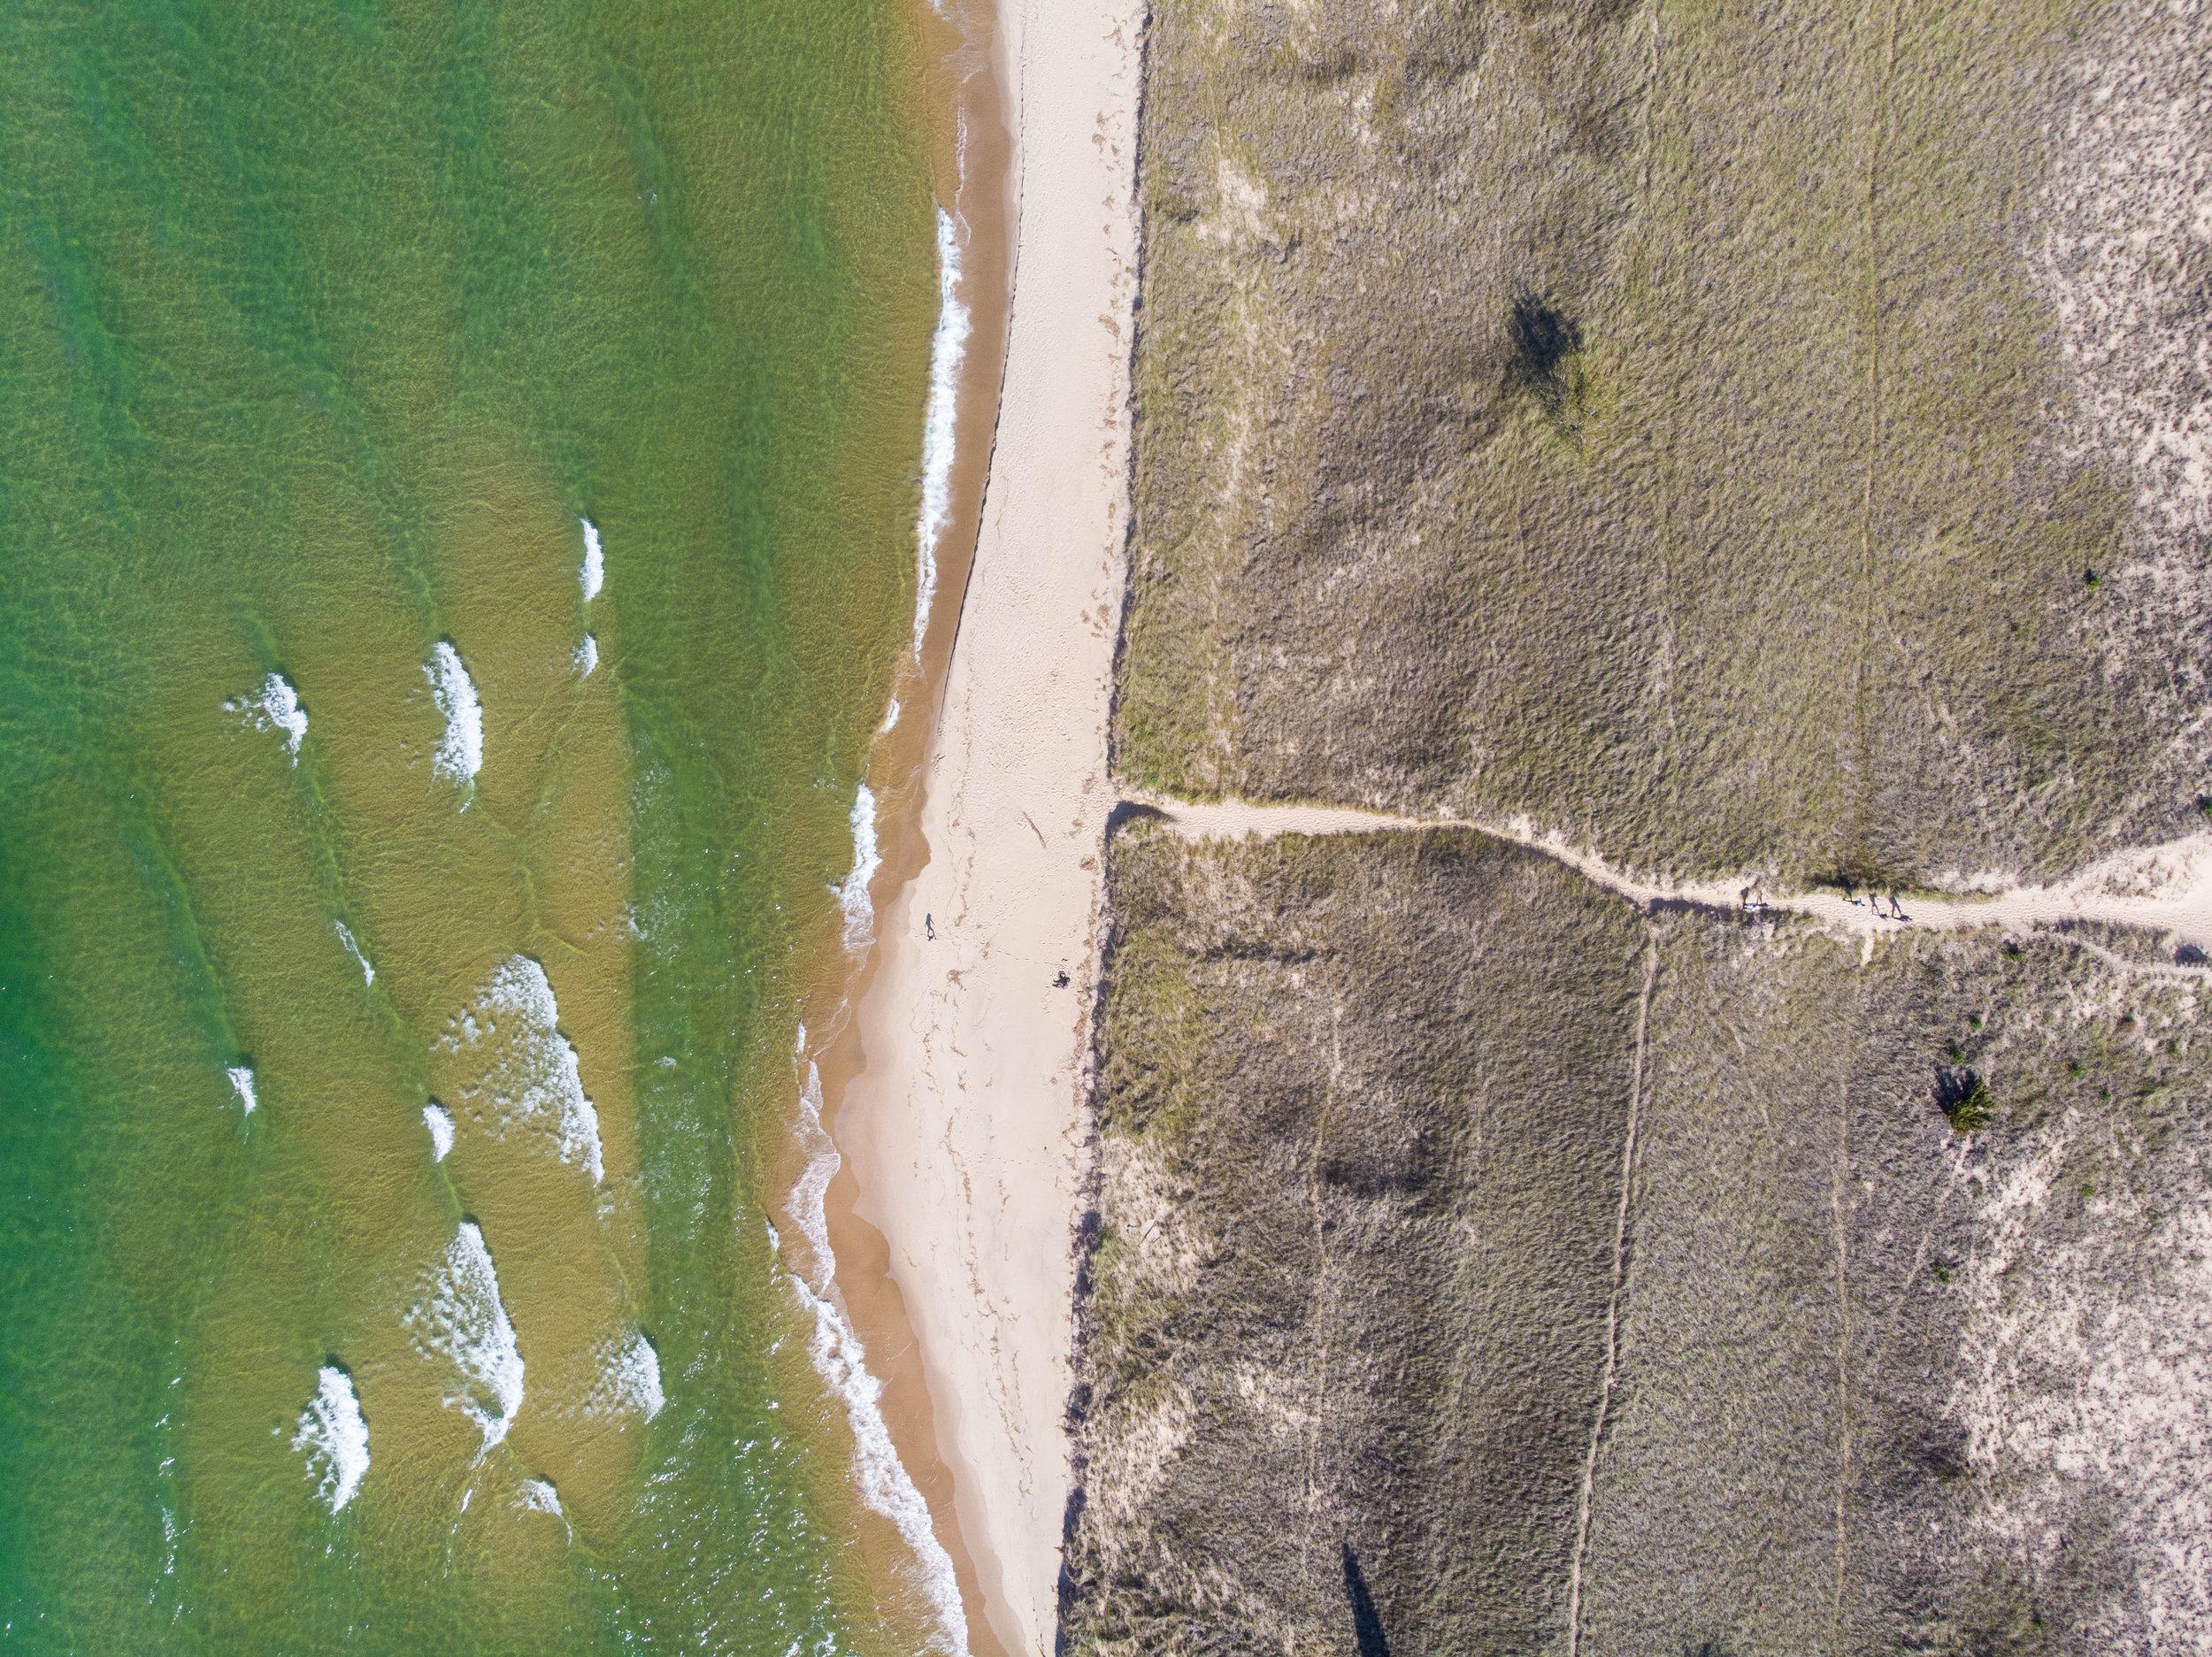 Drone shot of Lake Michigan just south of Holland, Michigan